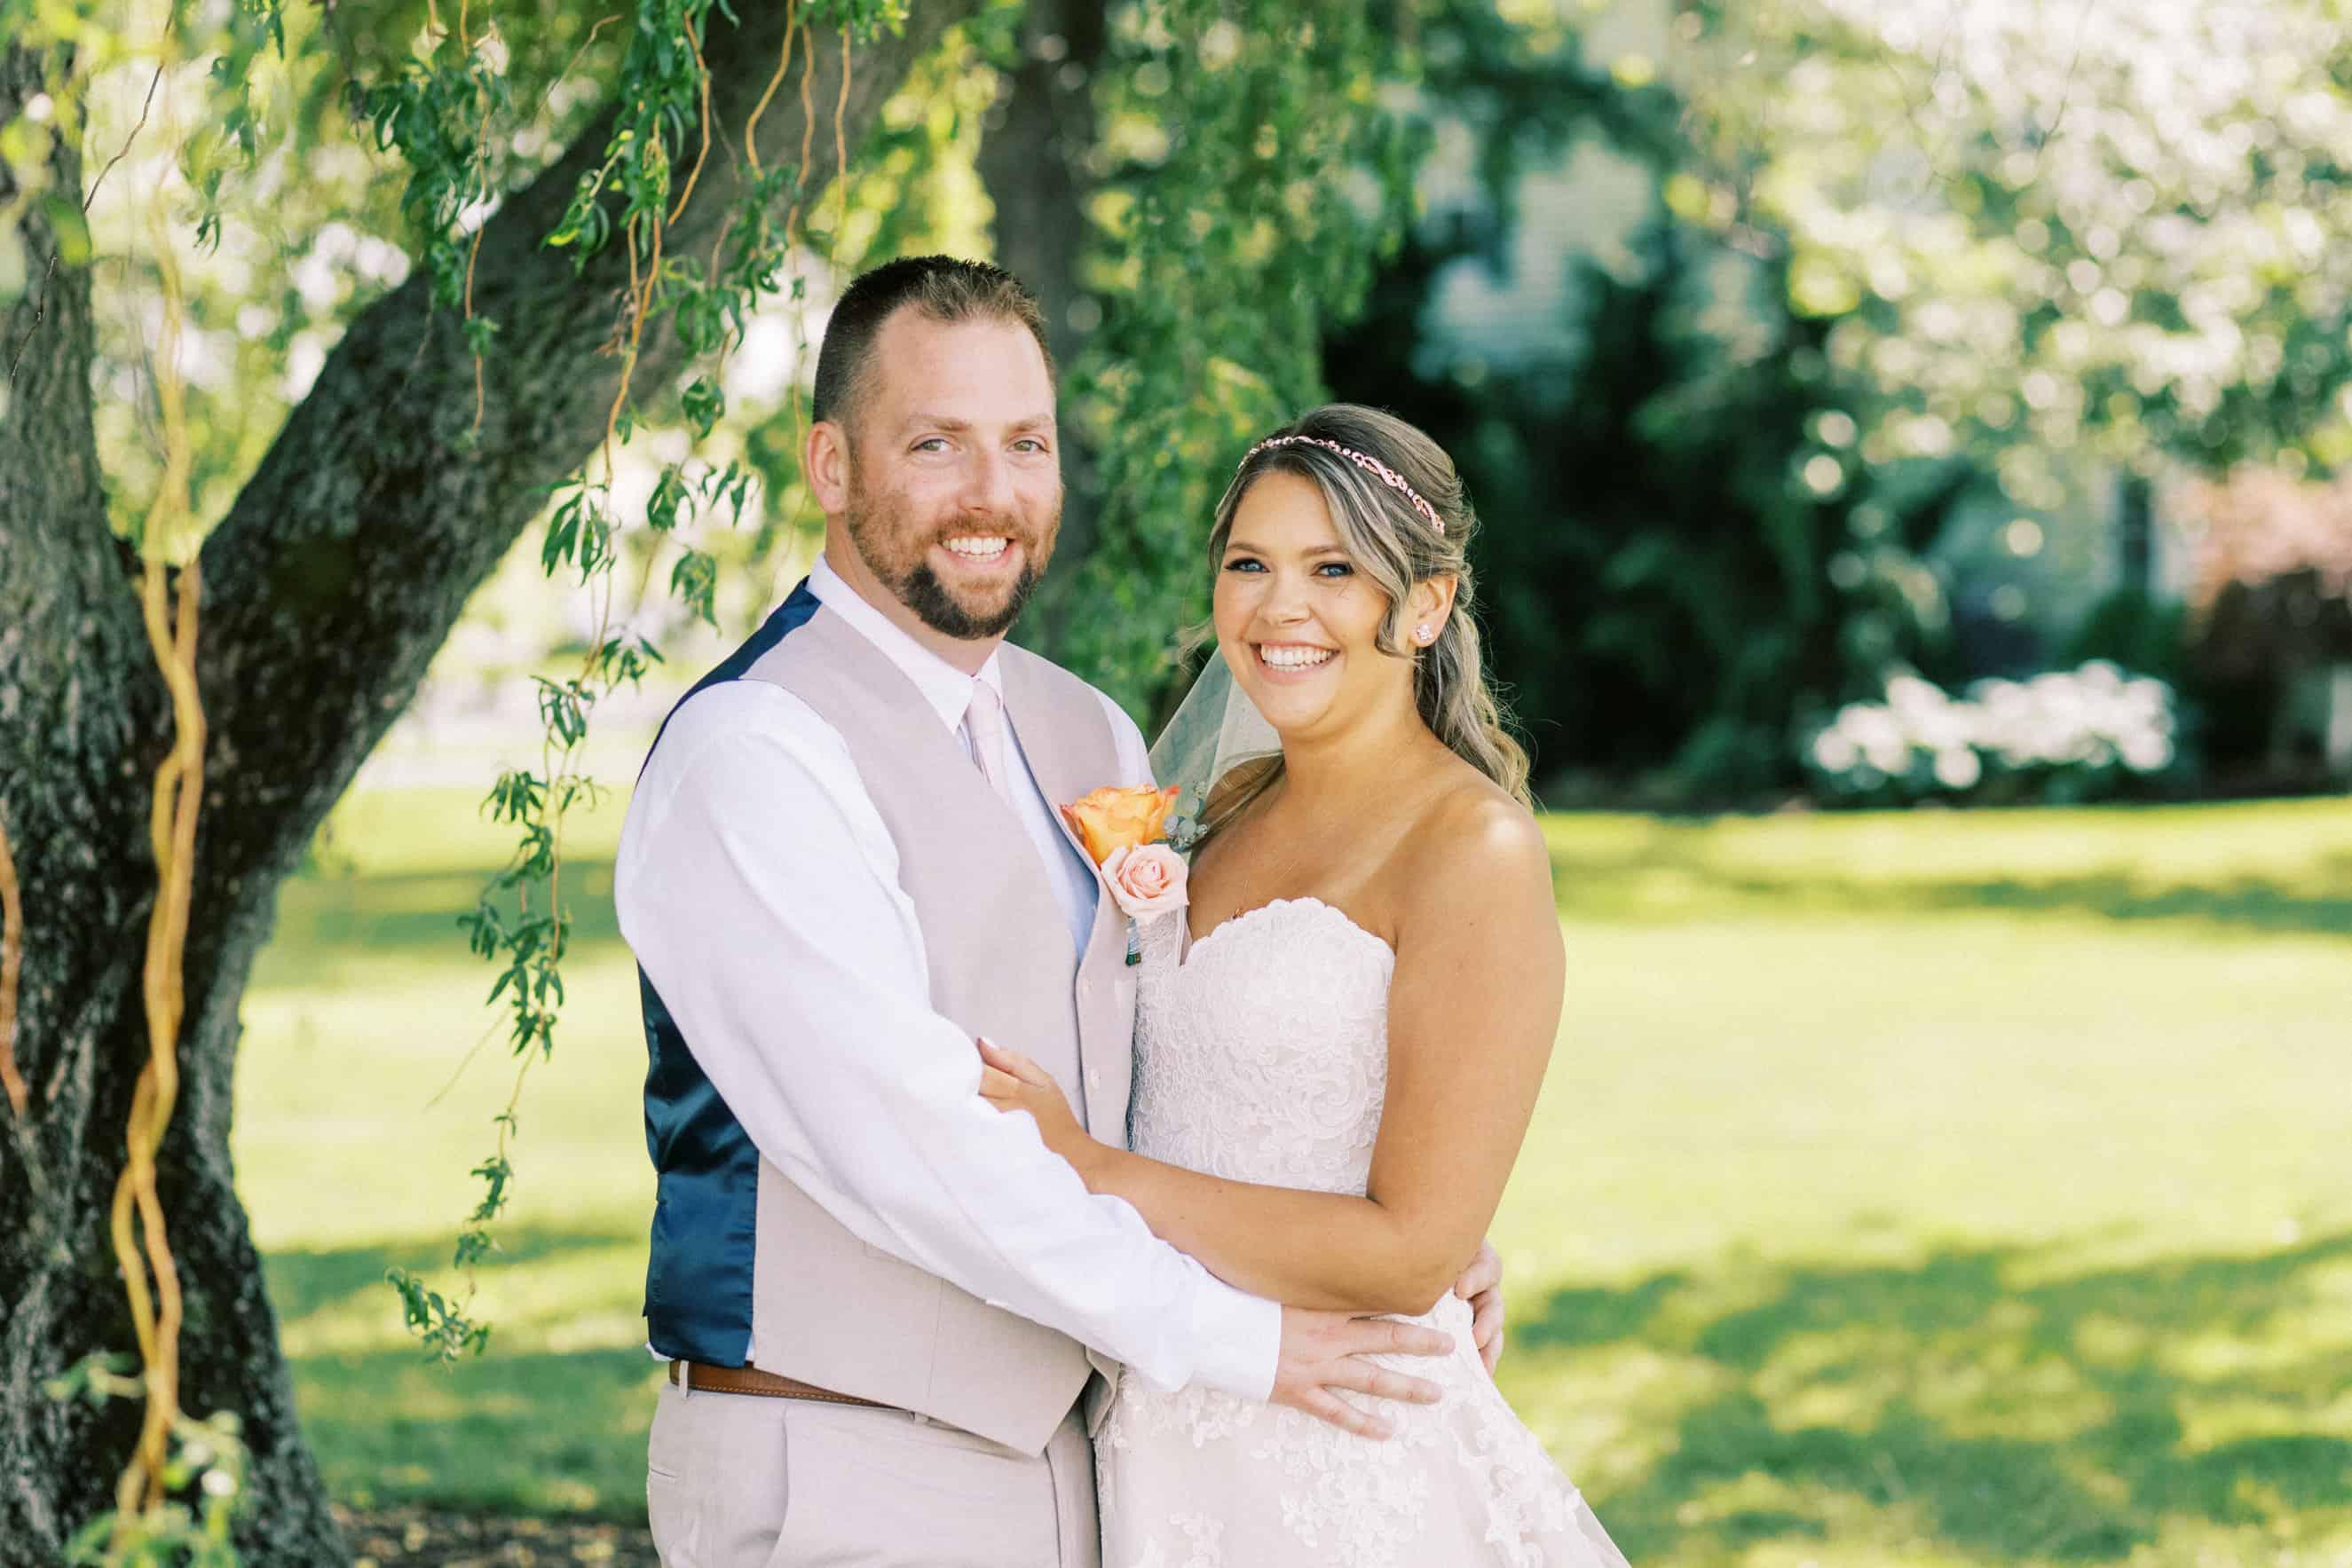 Wedding Photographer Harvest View Barn